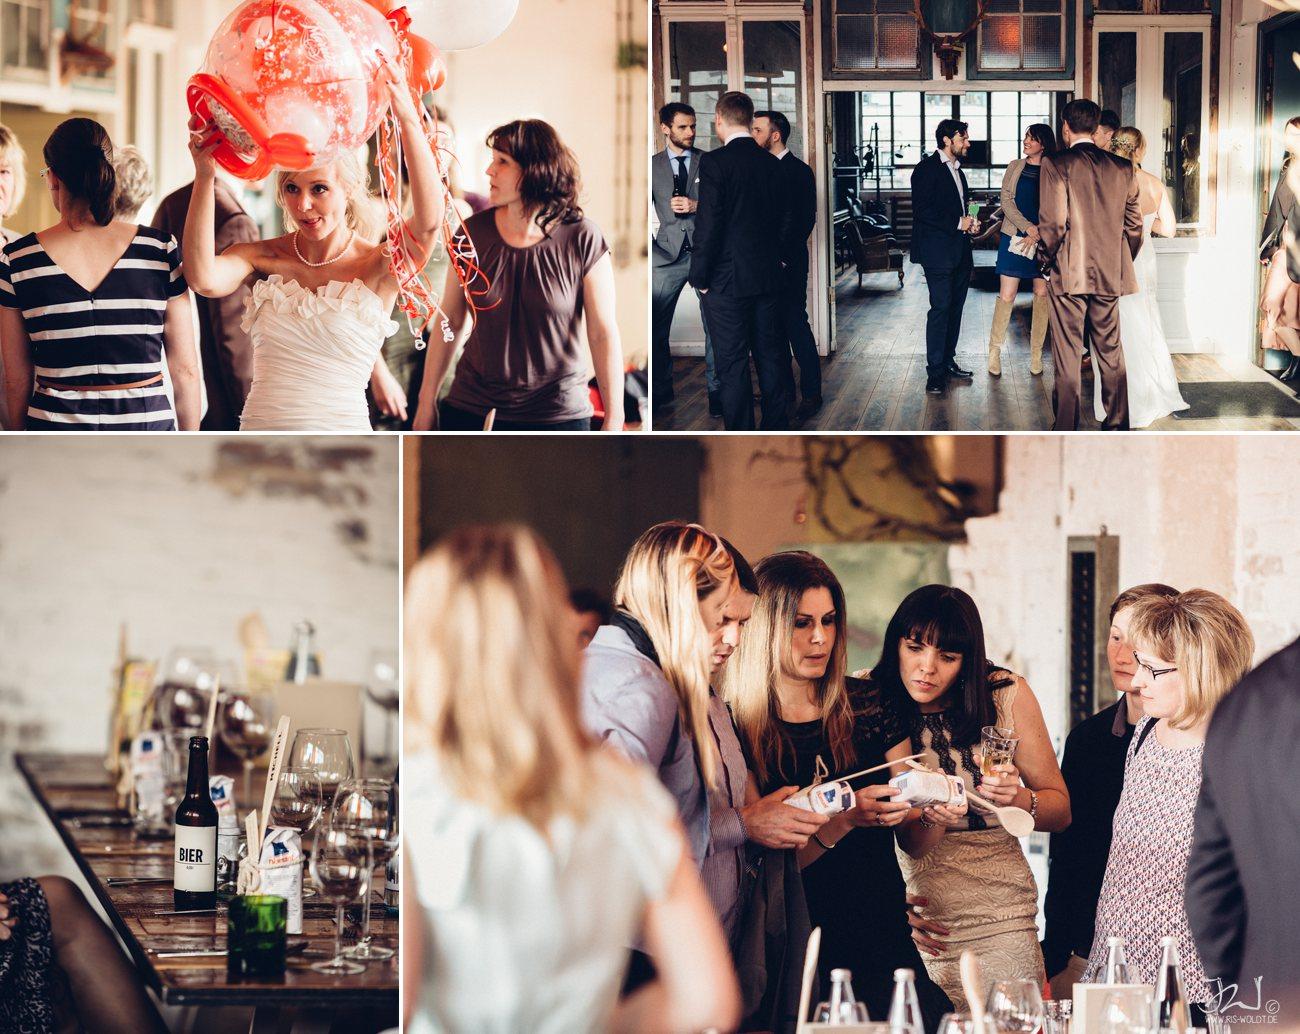 Hochzeitsfotograf_Fabrik23_Berlin 43